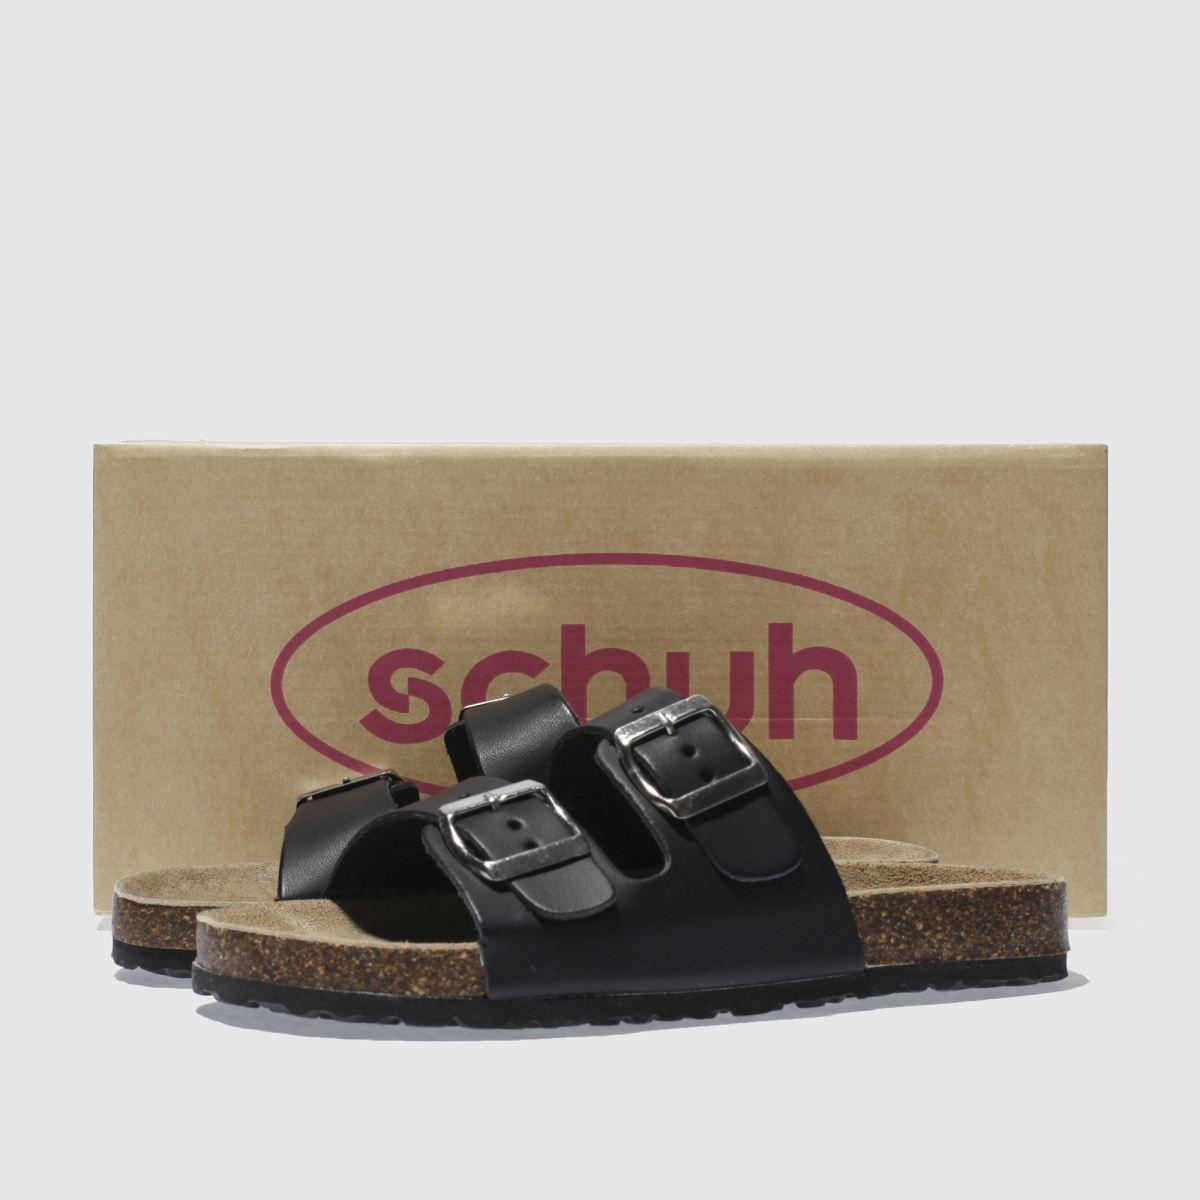 biggest discount factory authentic best value schuh black hawaii sandals   my style   Sandals, Black ...